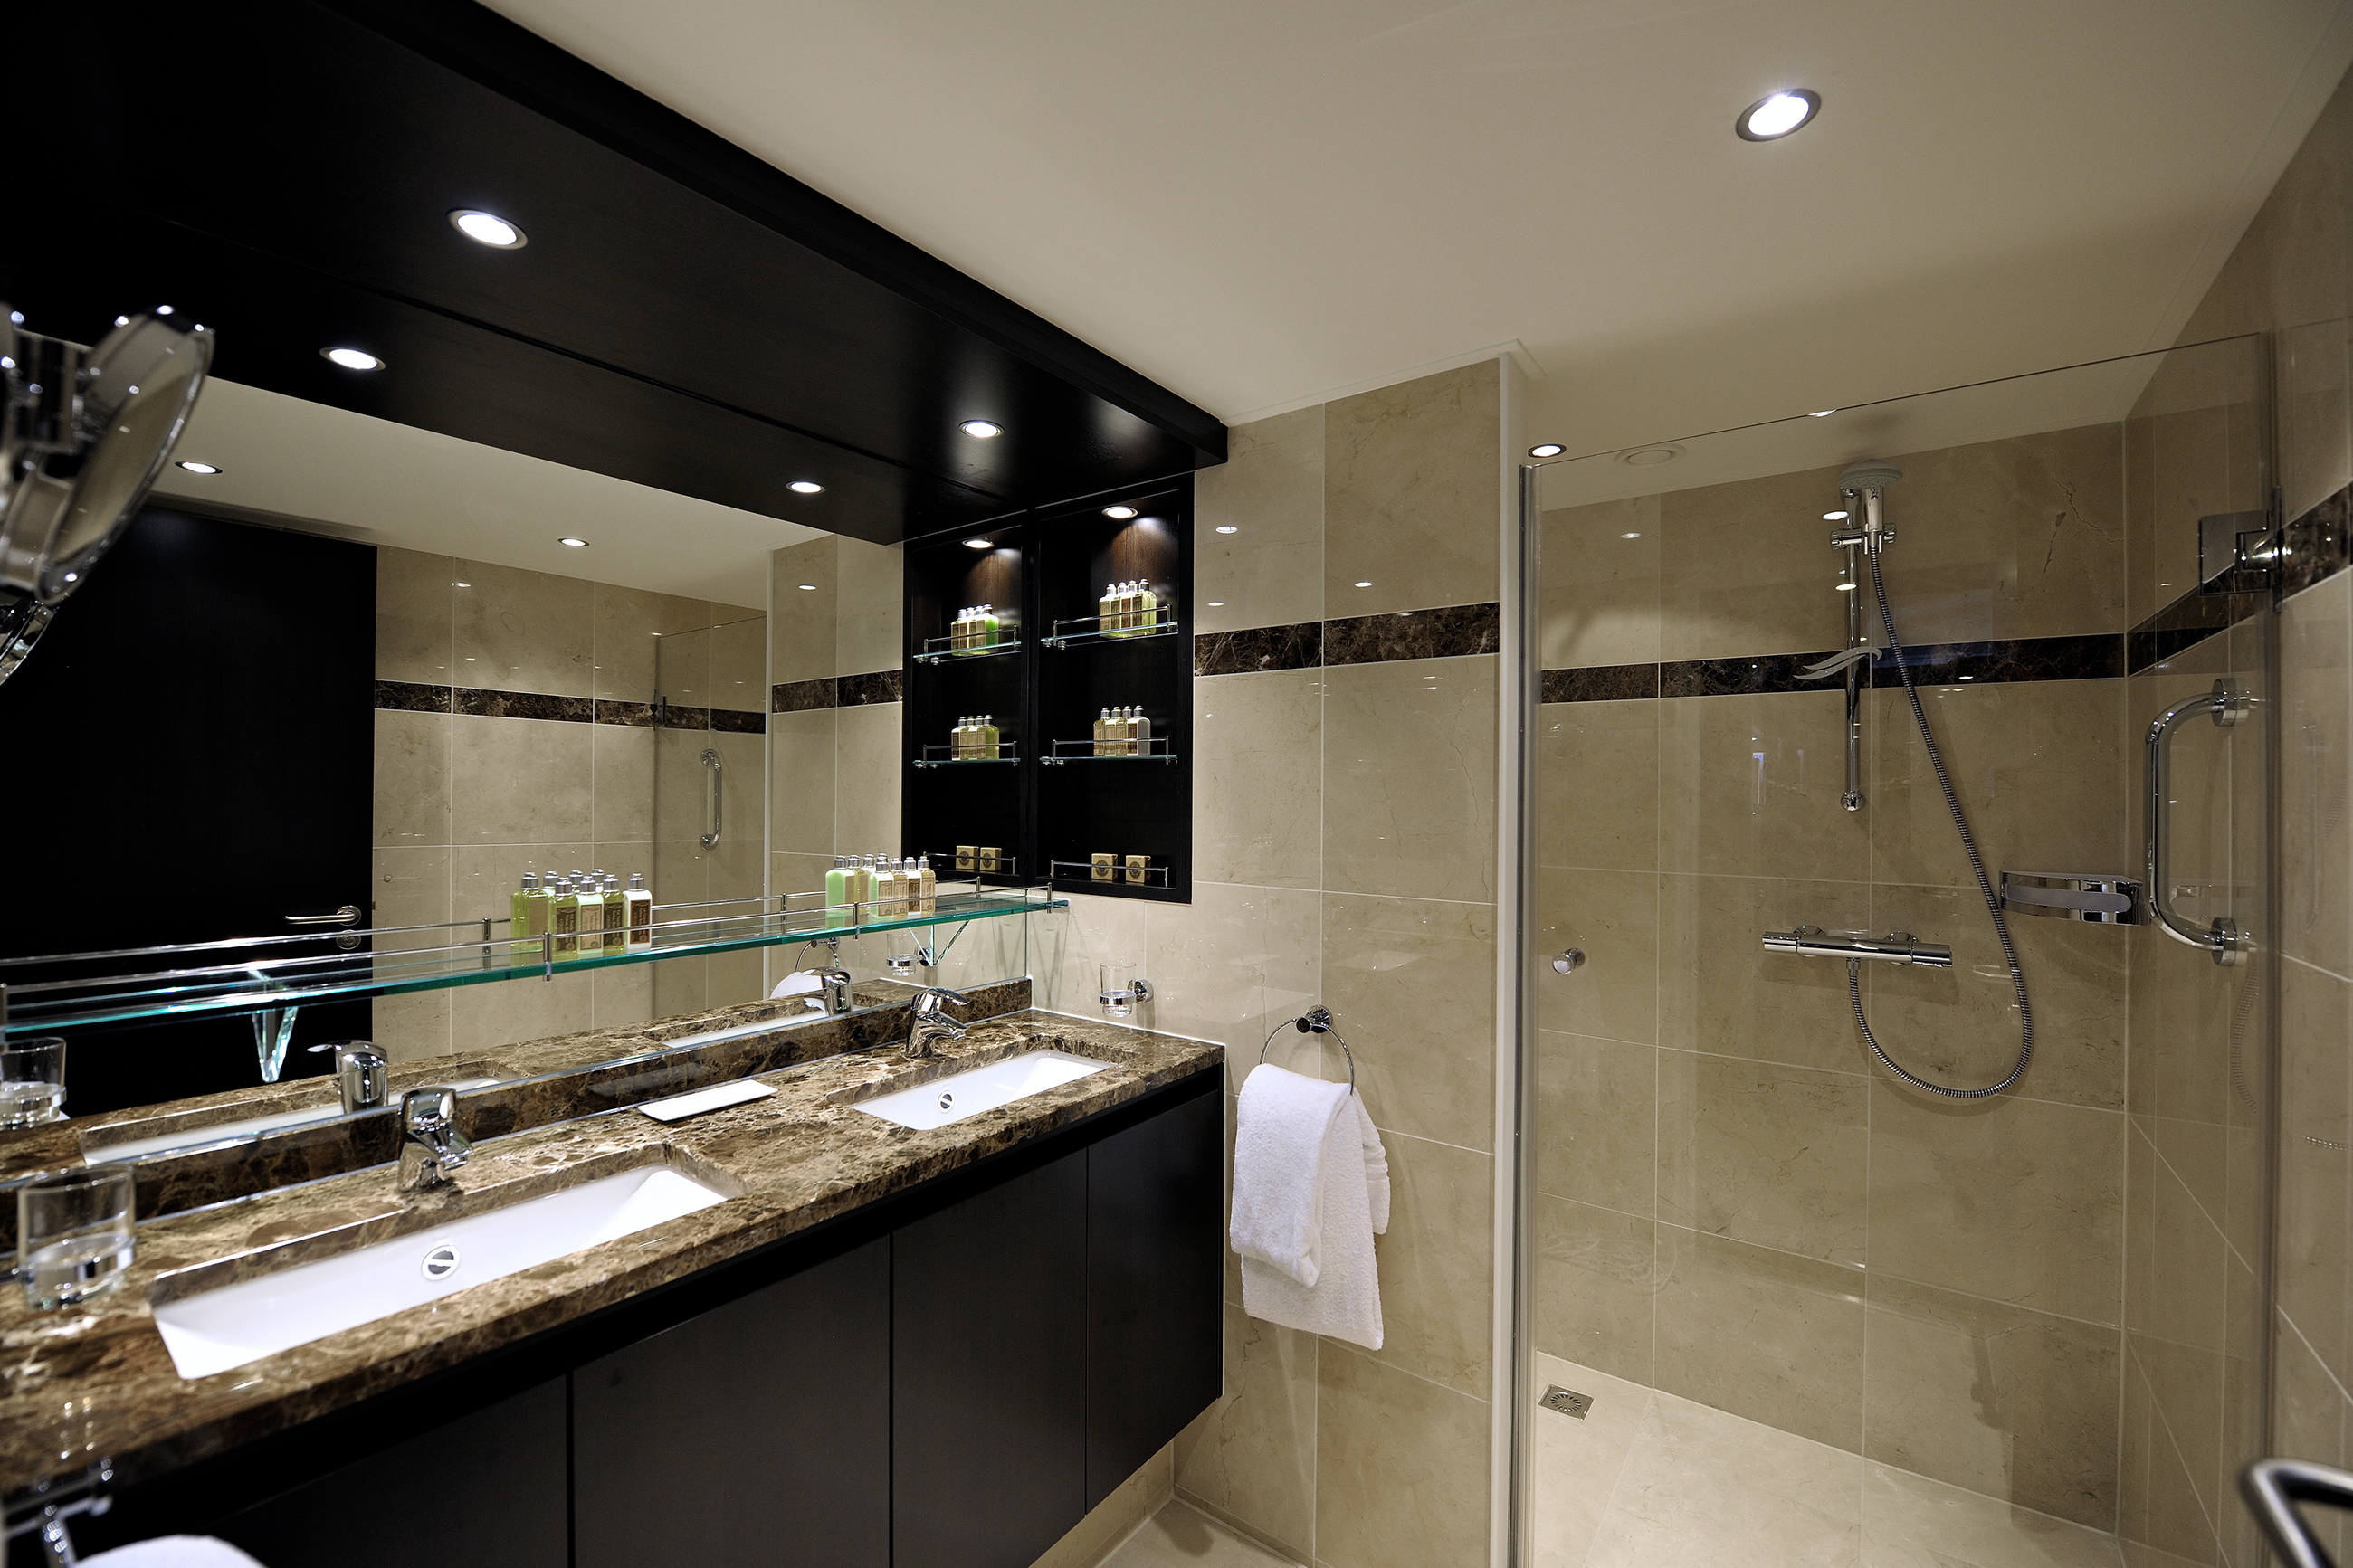 PANORAMA_panorama_bathroom.jpg